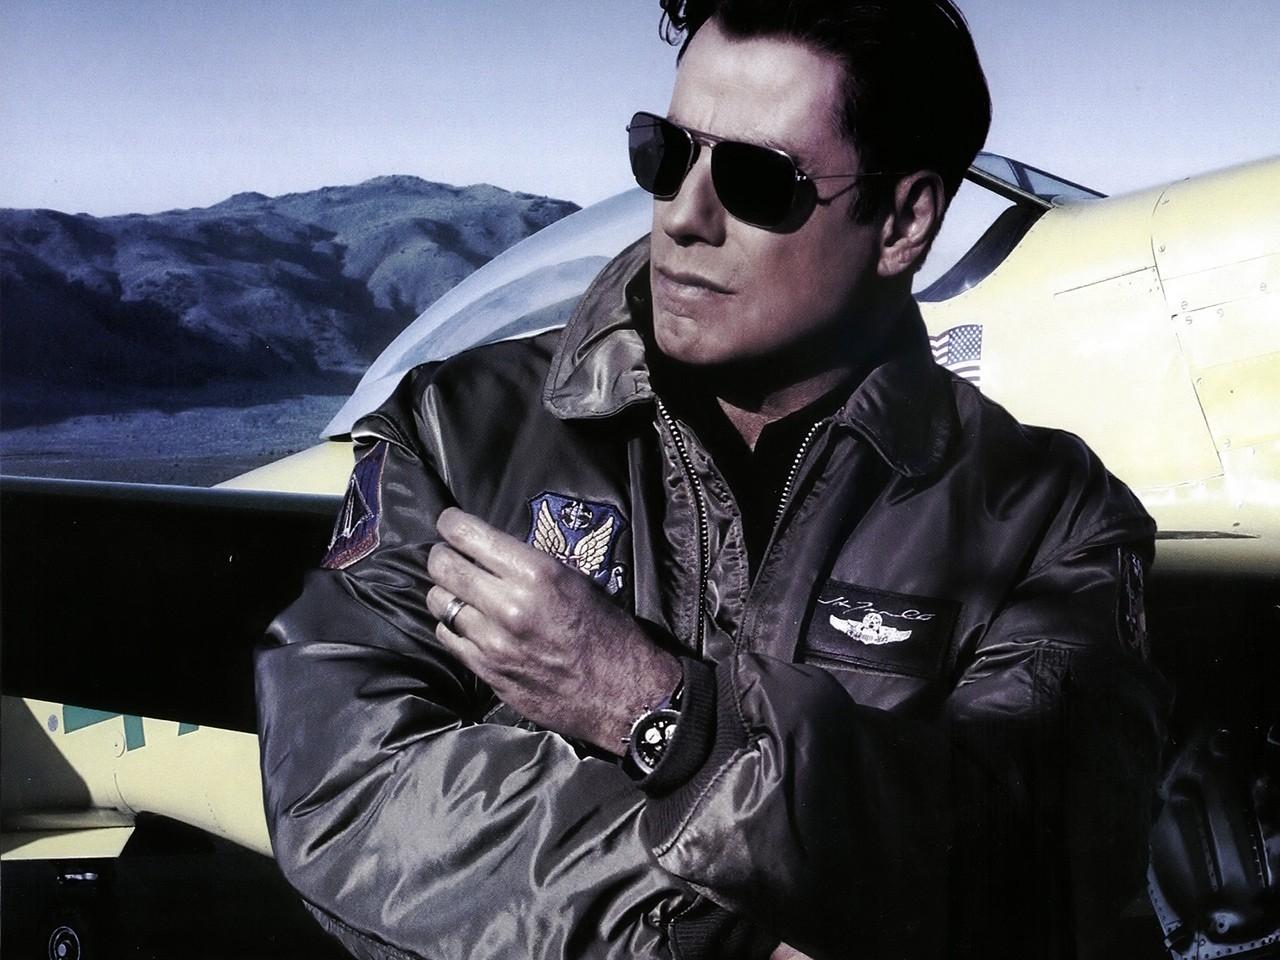 Be Cool 2005 John Travolta Wallpaper · John Travolta Wallpaper